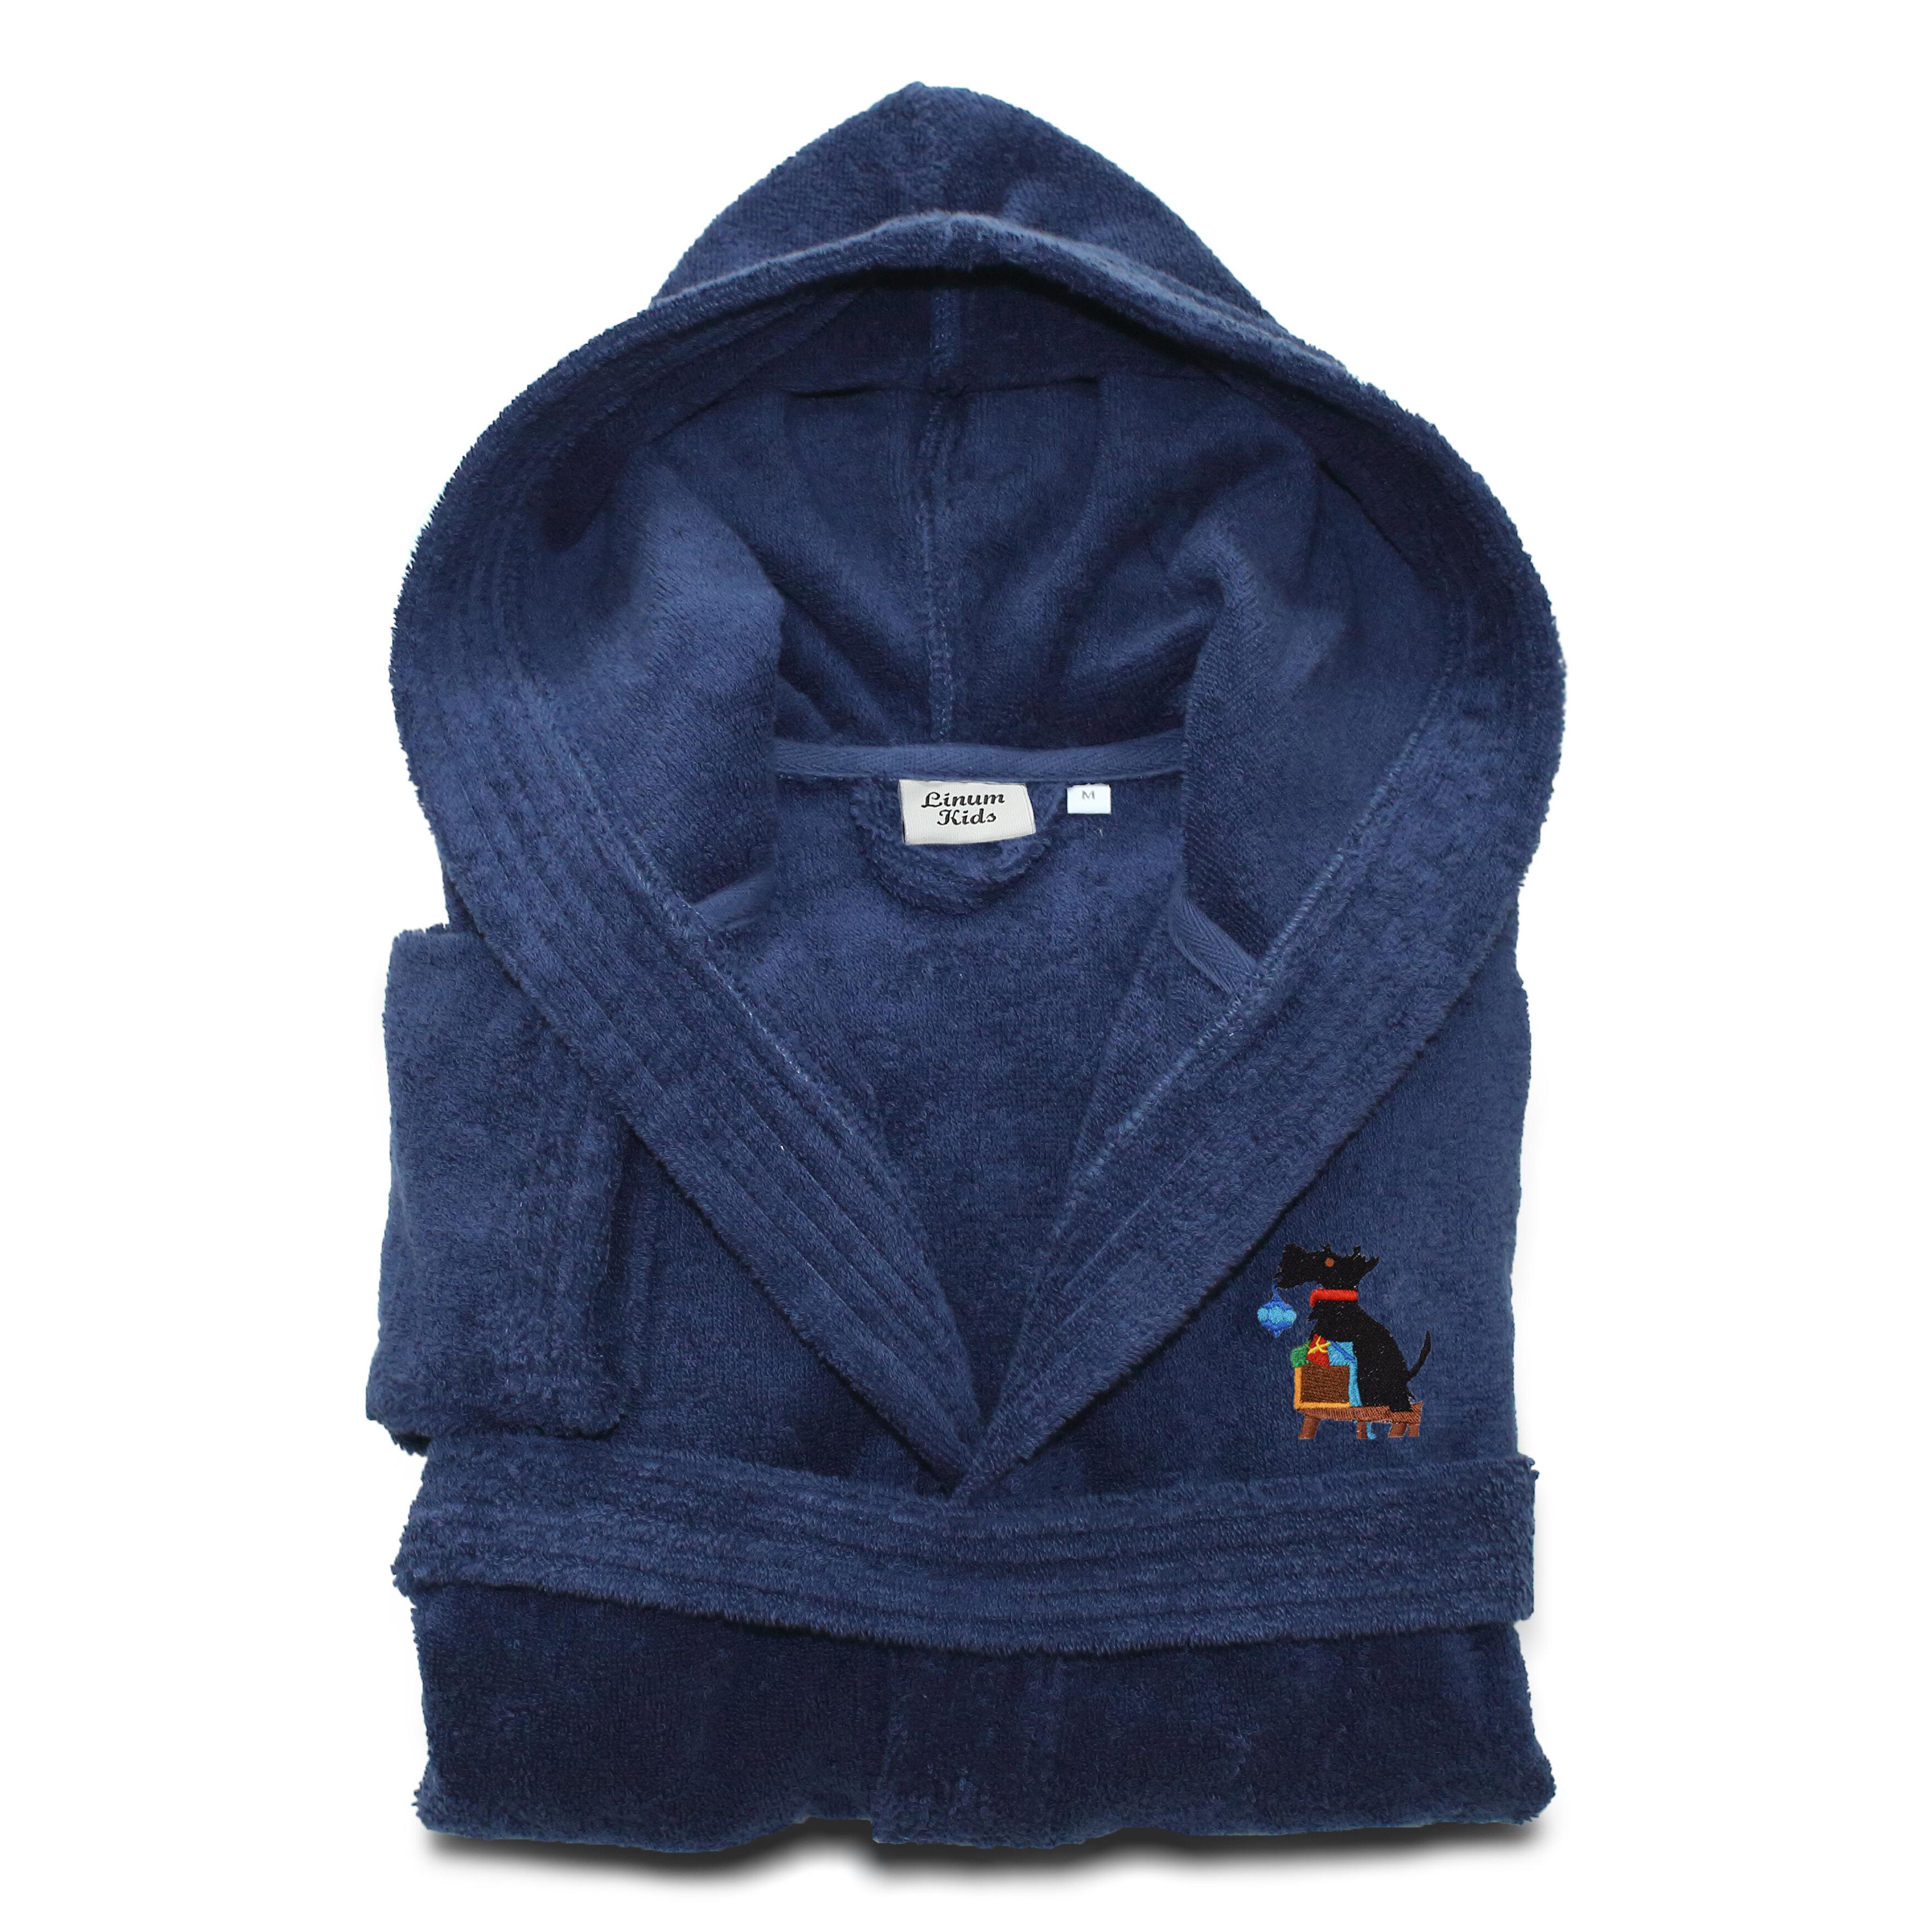 78f1741dfd Linum Home Textiles Christmas Dog Embroidered 100% Cotton Terry Cloth  Bathrobe